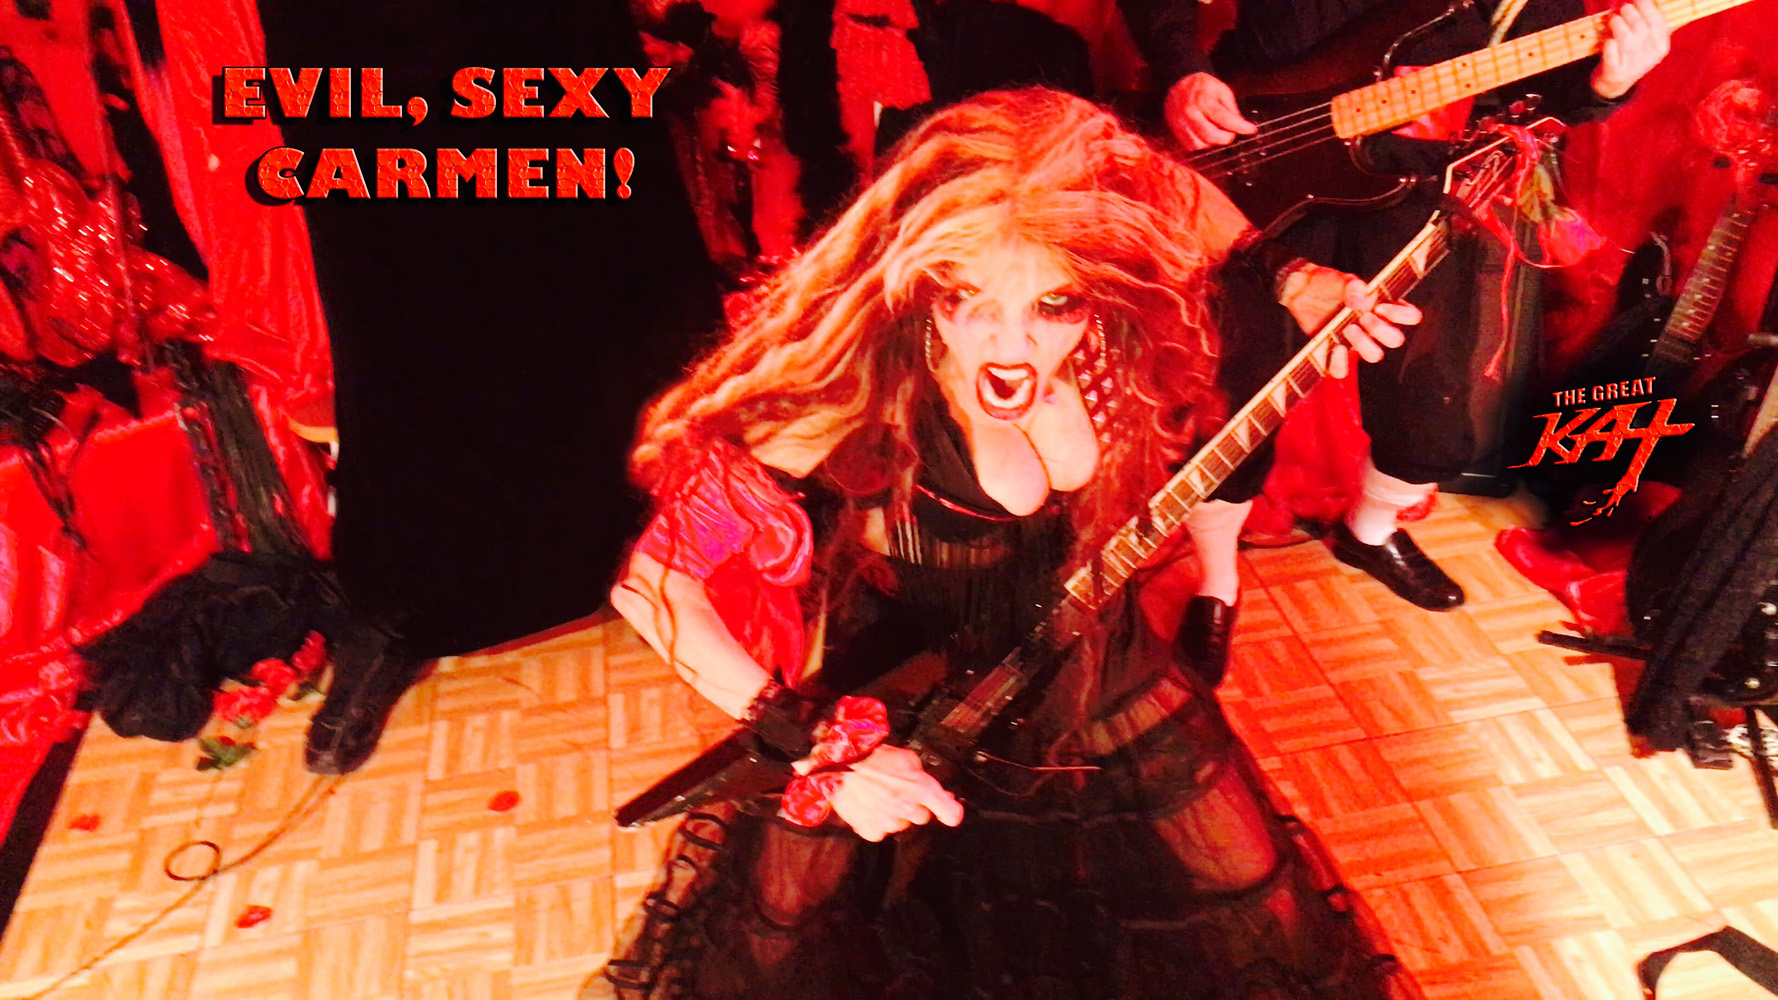 "EVIL, SEXY CARMEN!! From The Great Kat's SARASATE'S ""CARMEN FANTASY"" MUSIC VIDEO!"